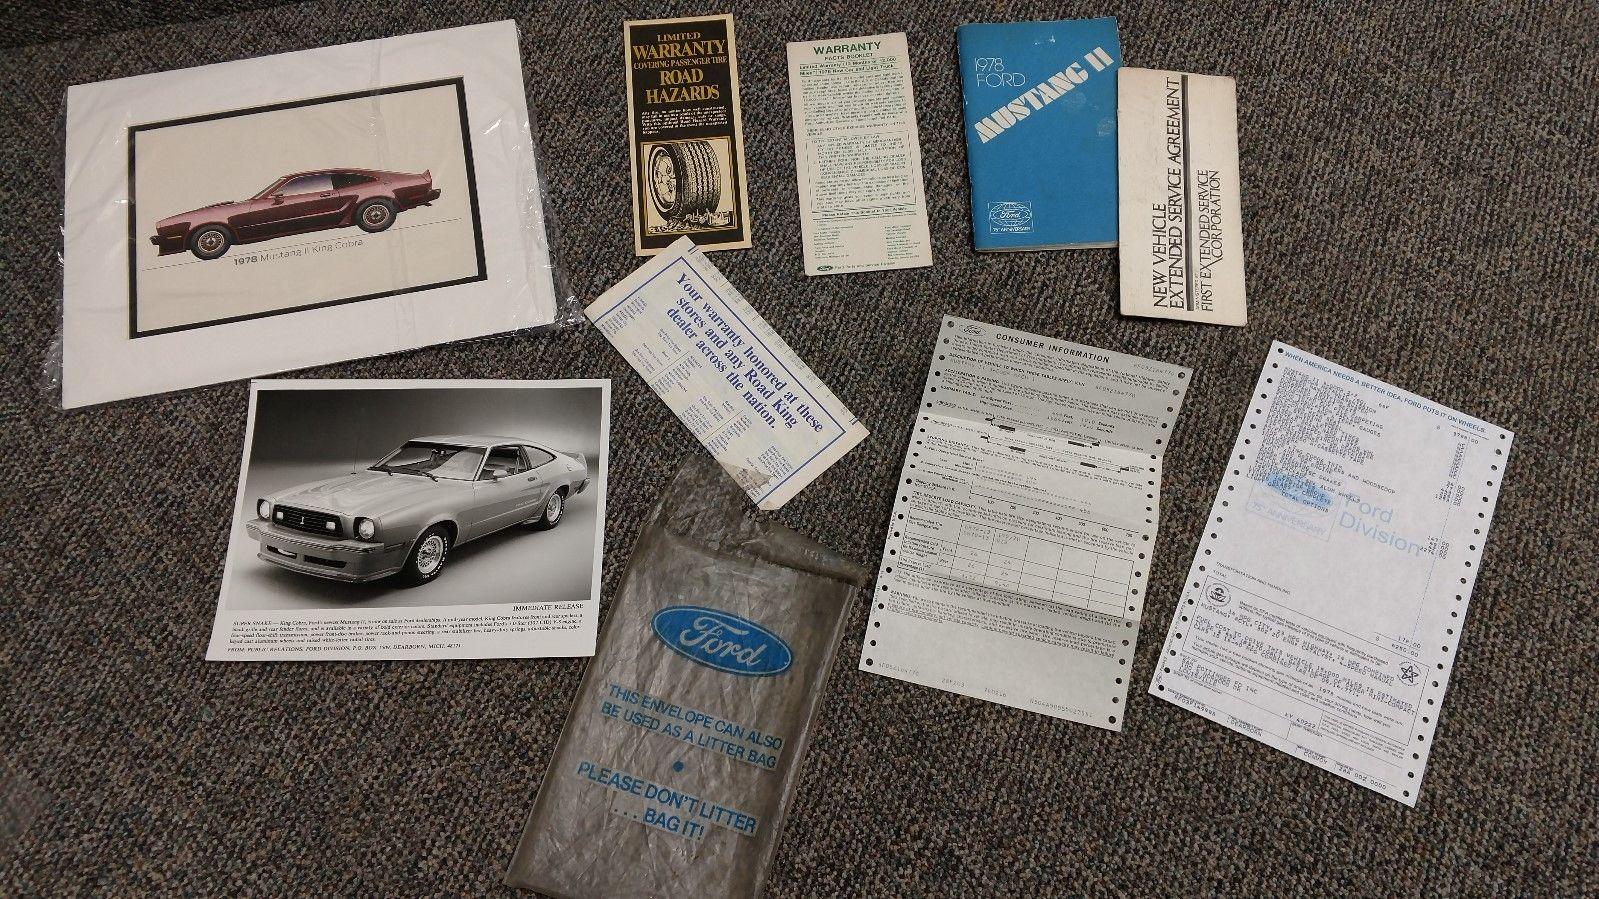 1978 Ford Mustang II King Cobra documentation